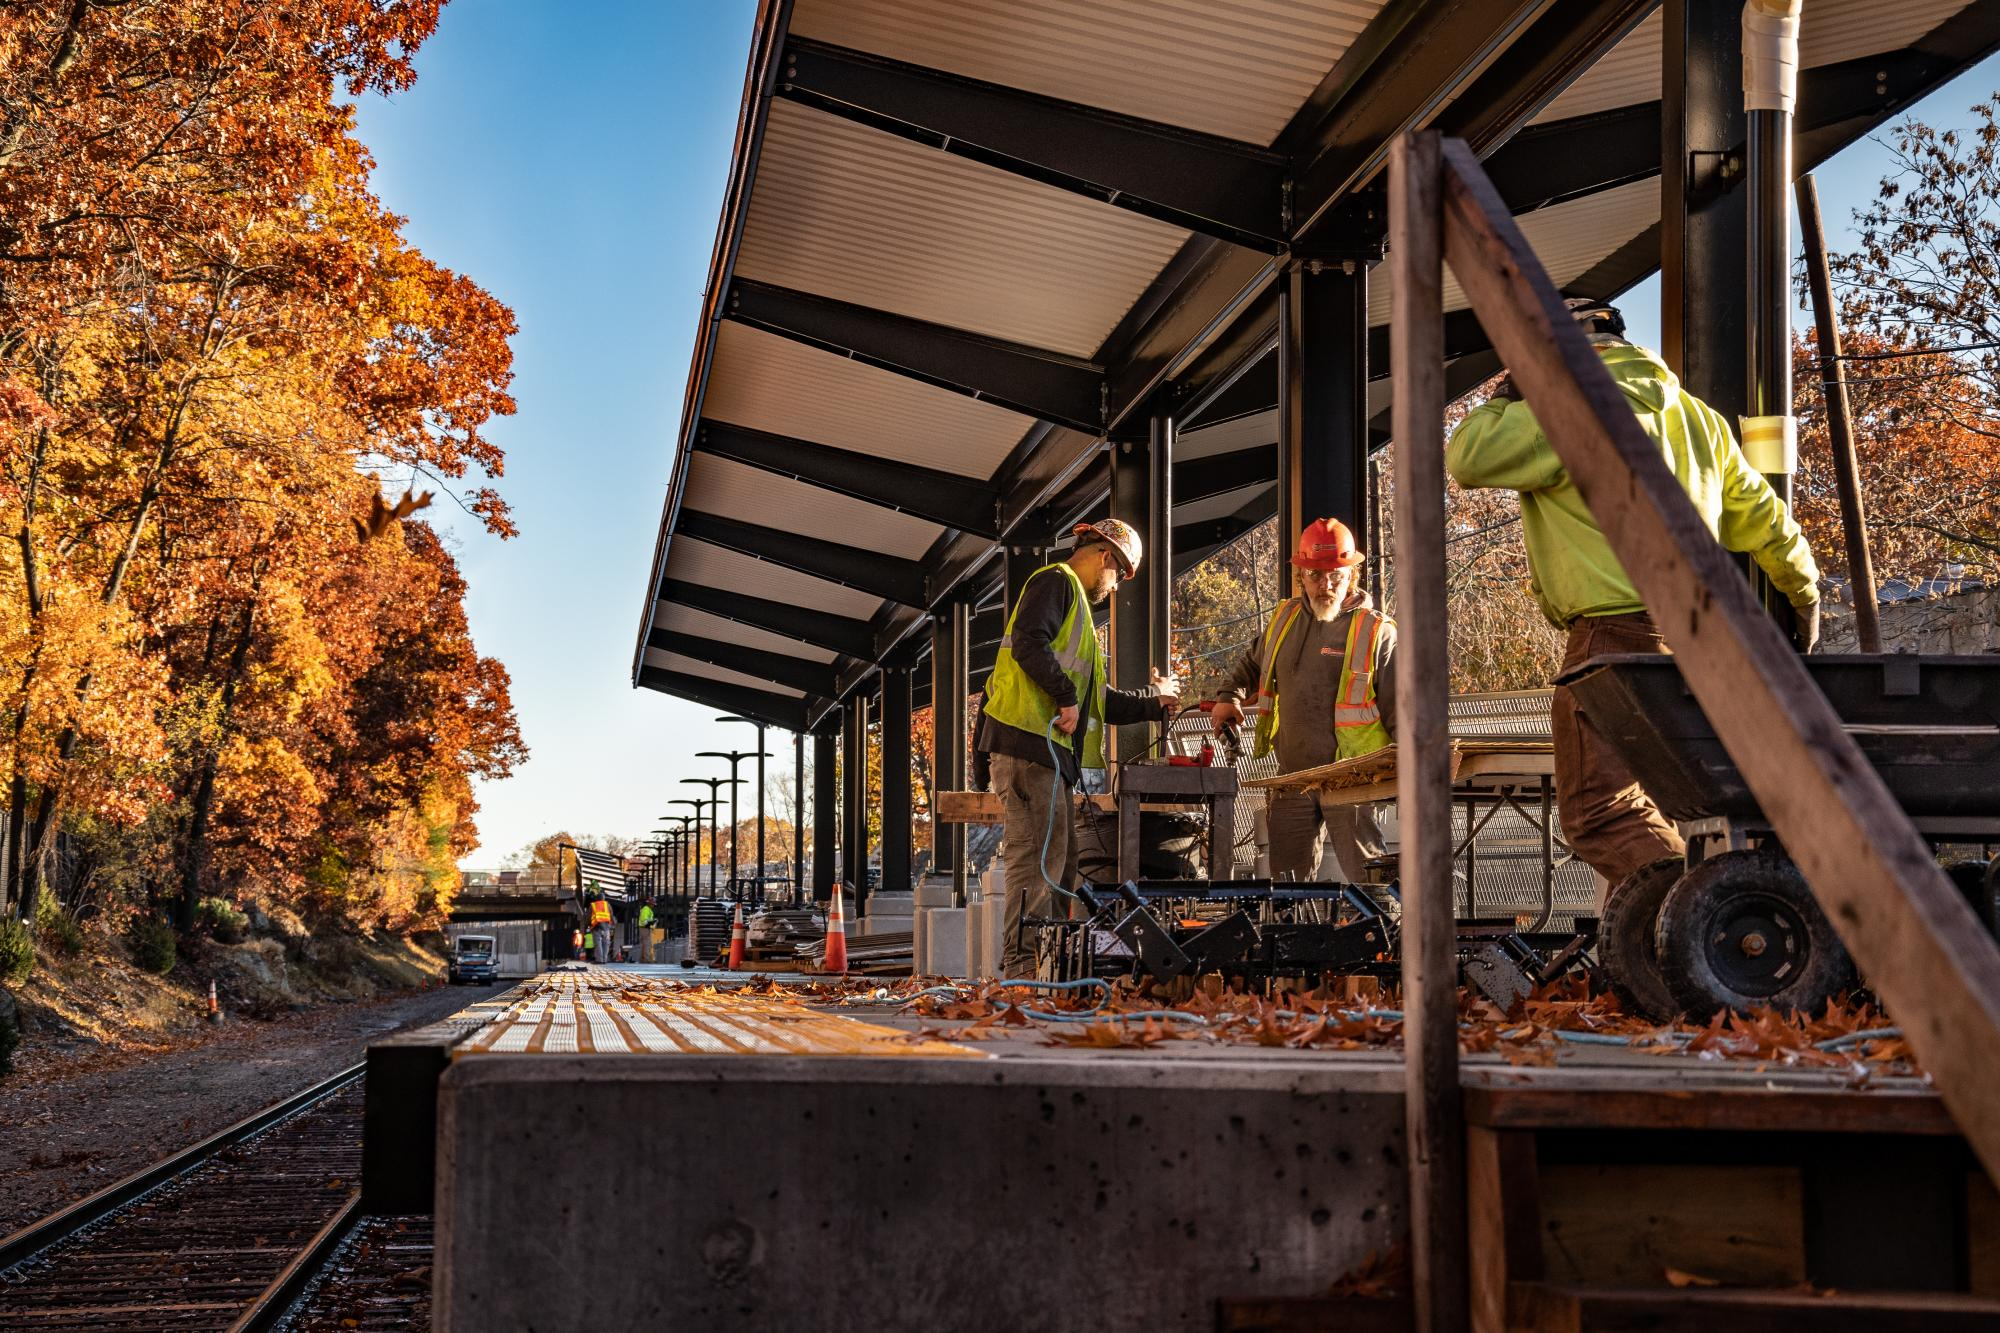 Blue Hill Ave station platform with canopy (November 2018)